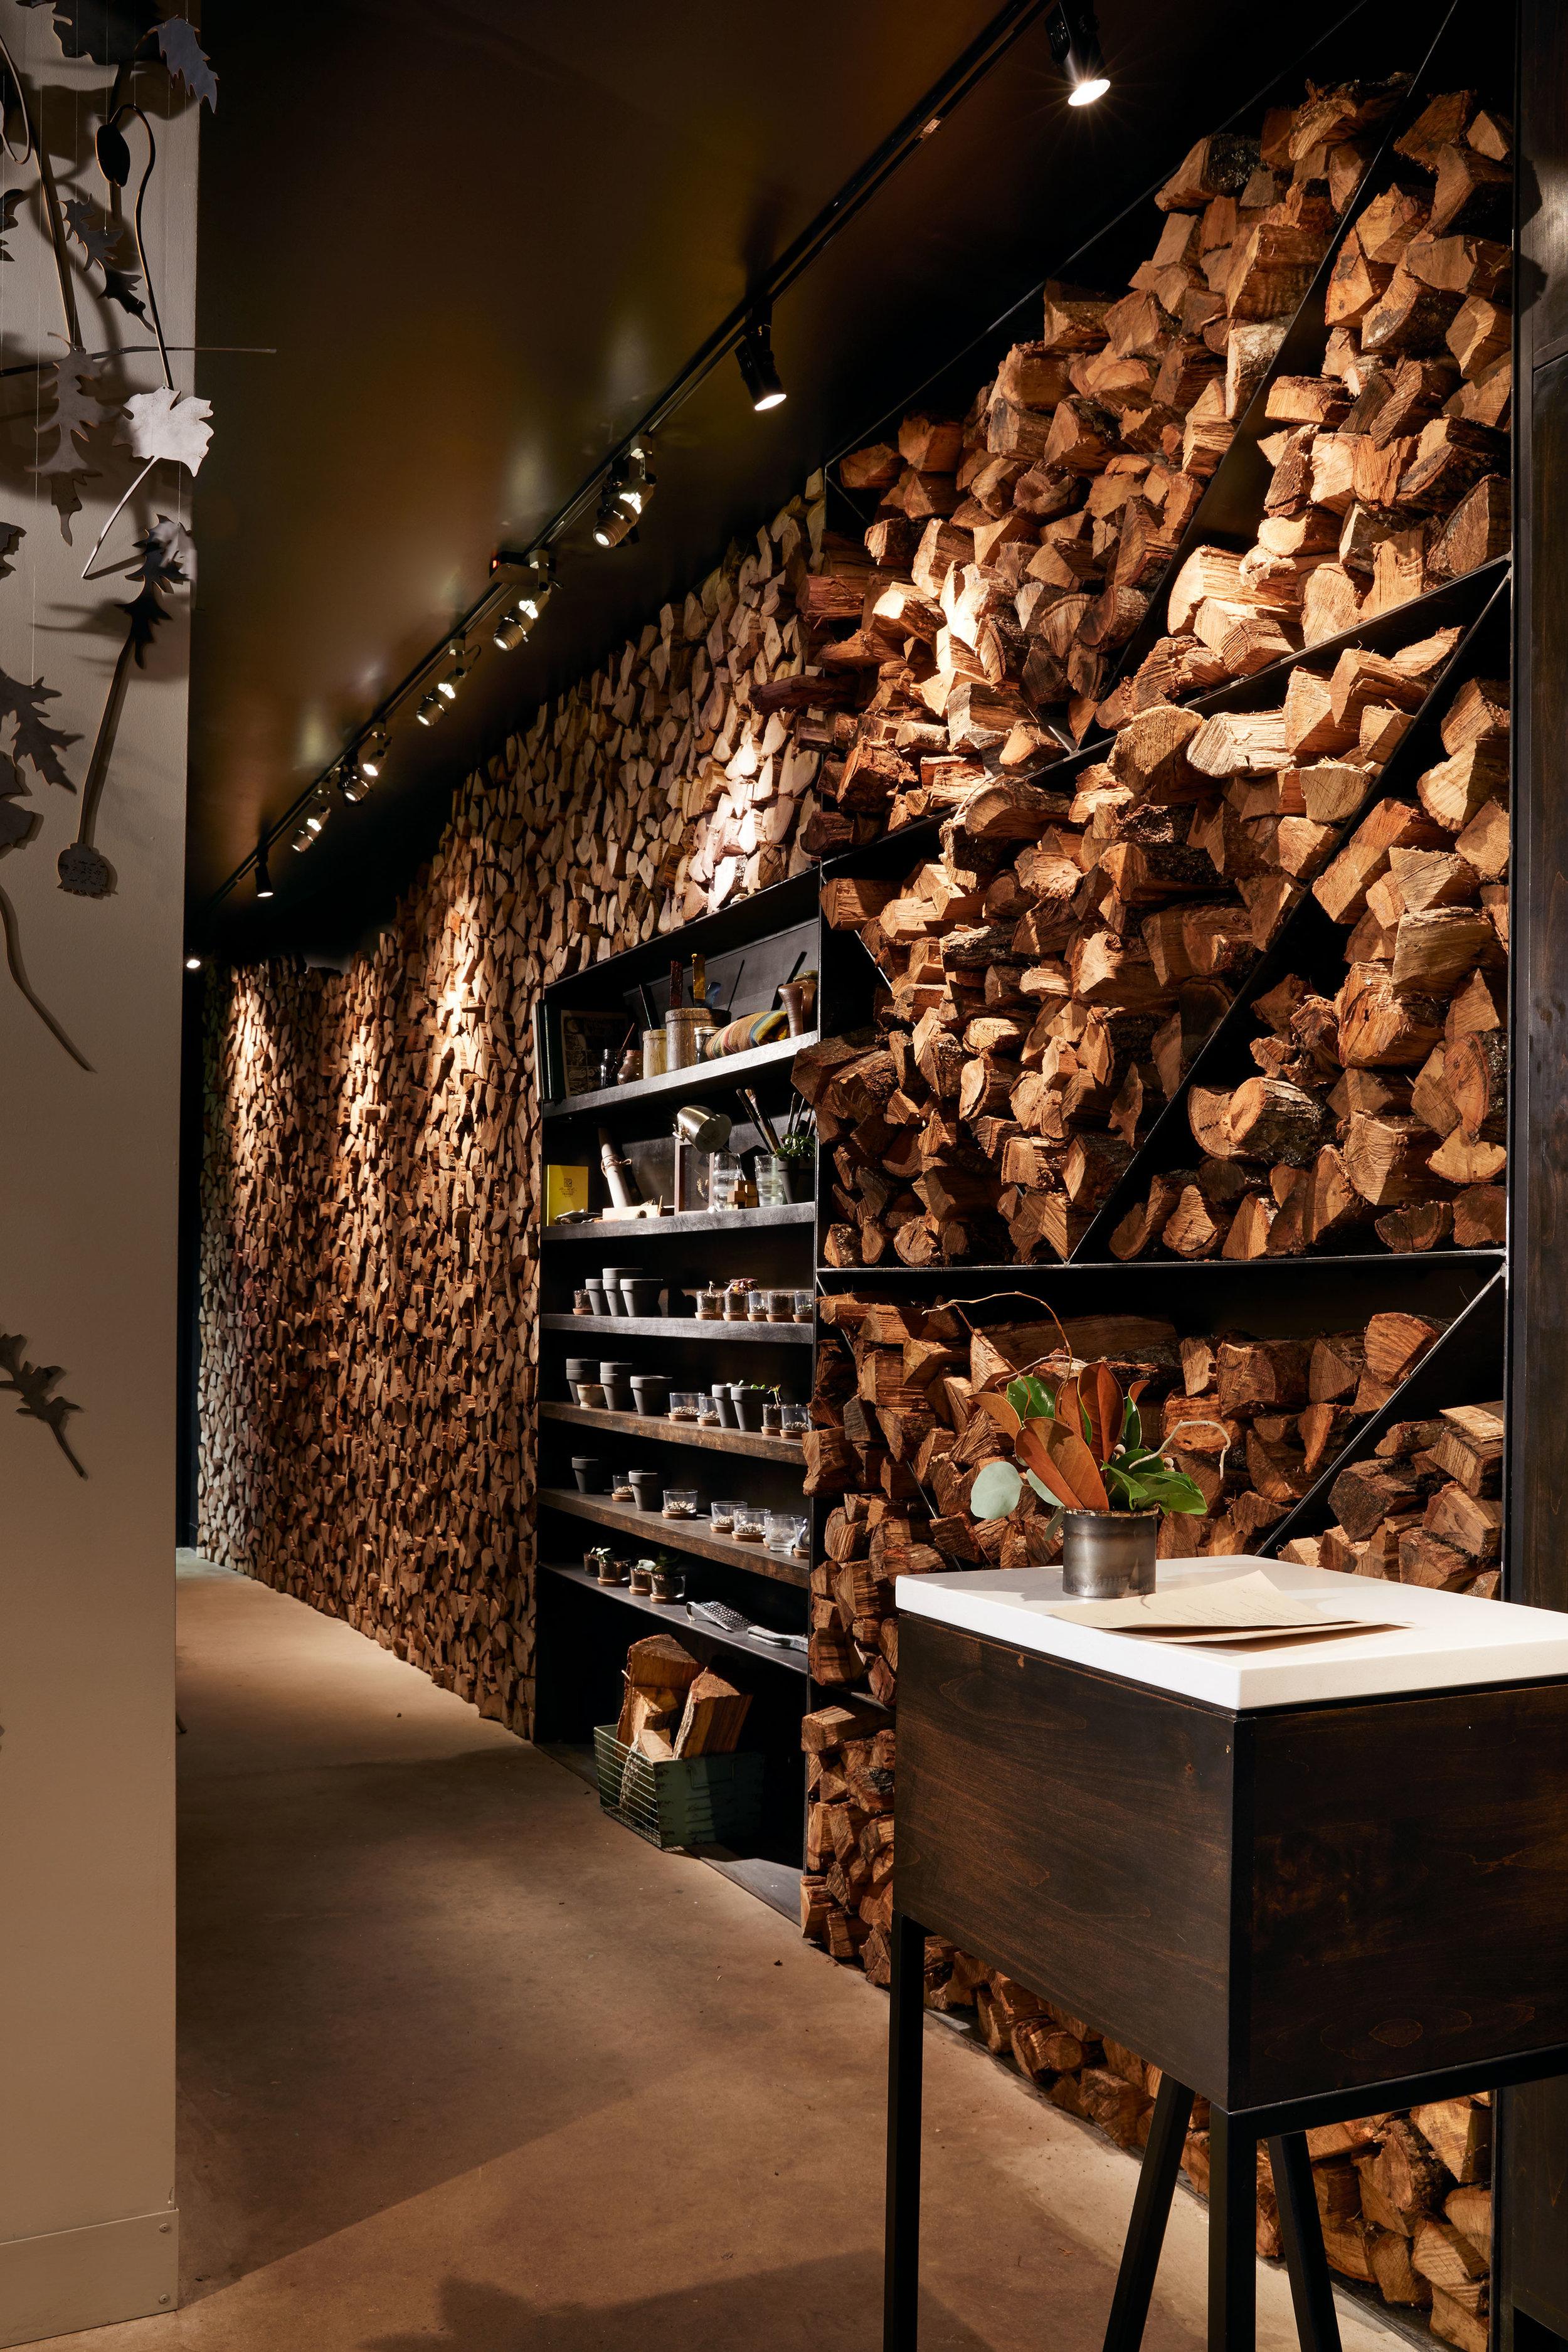 10 unexpectedly romantic restaurants and bars in Denver (zagat)